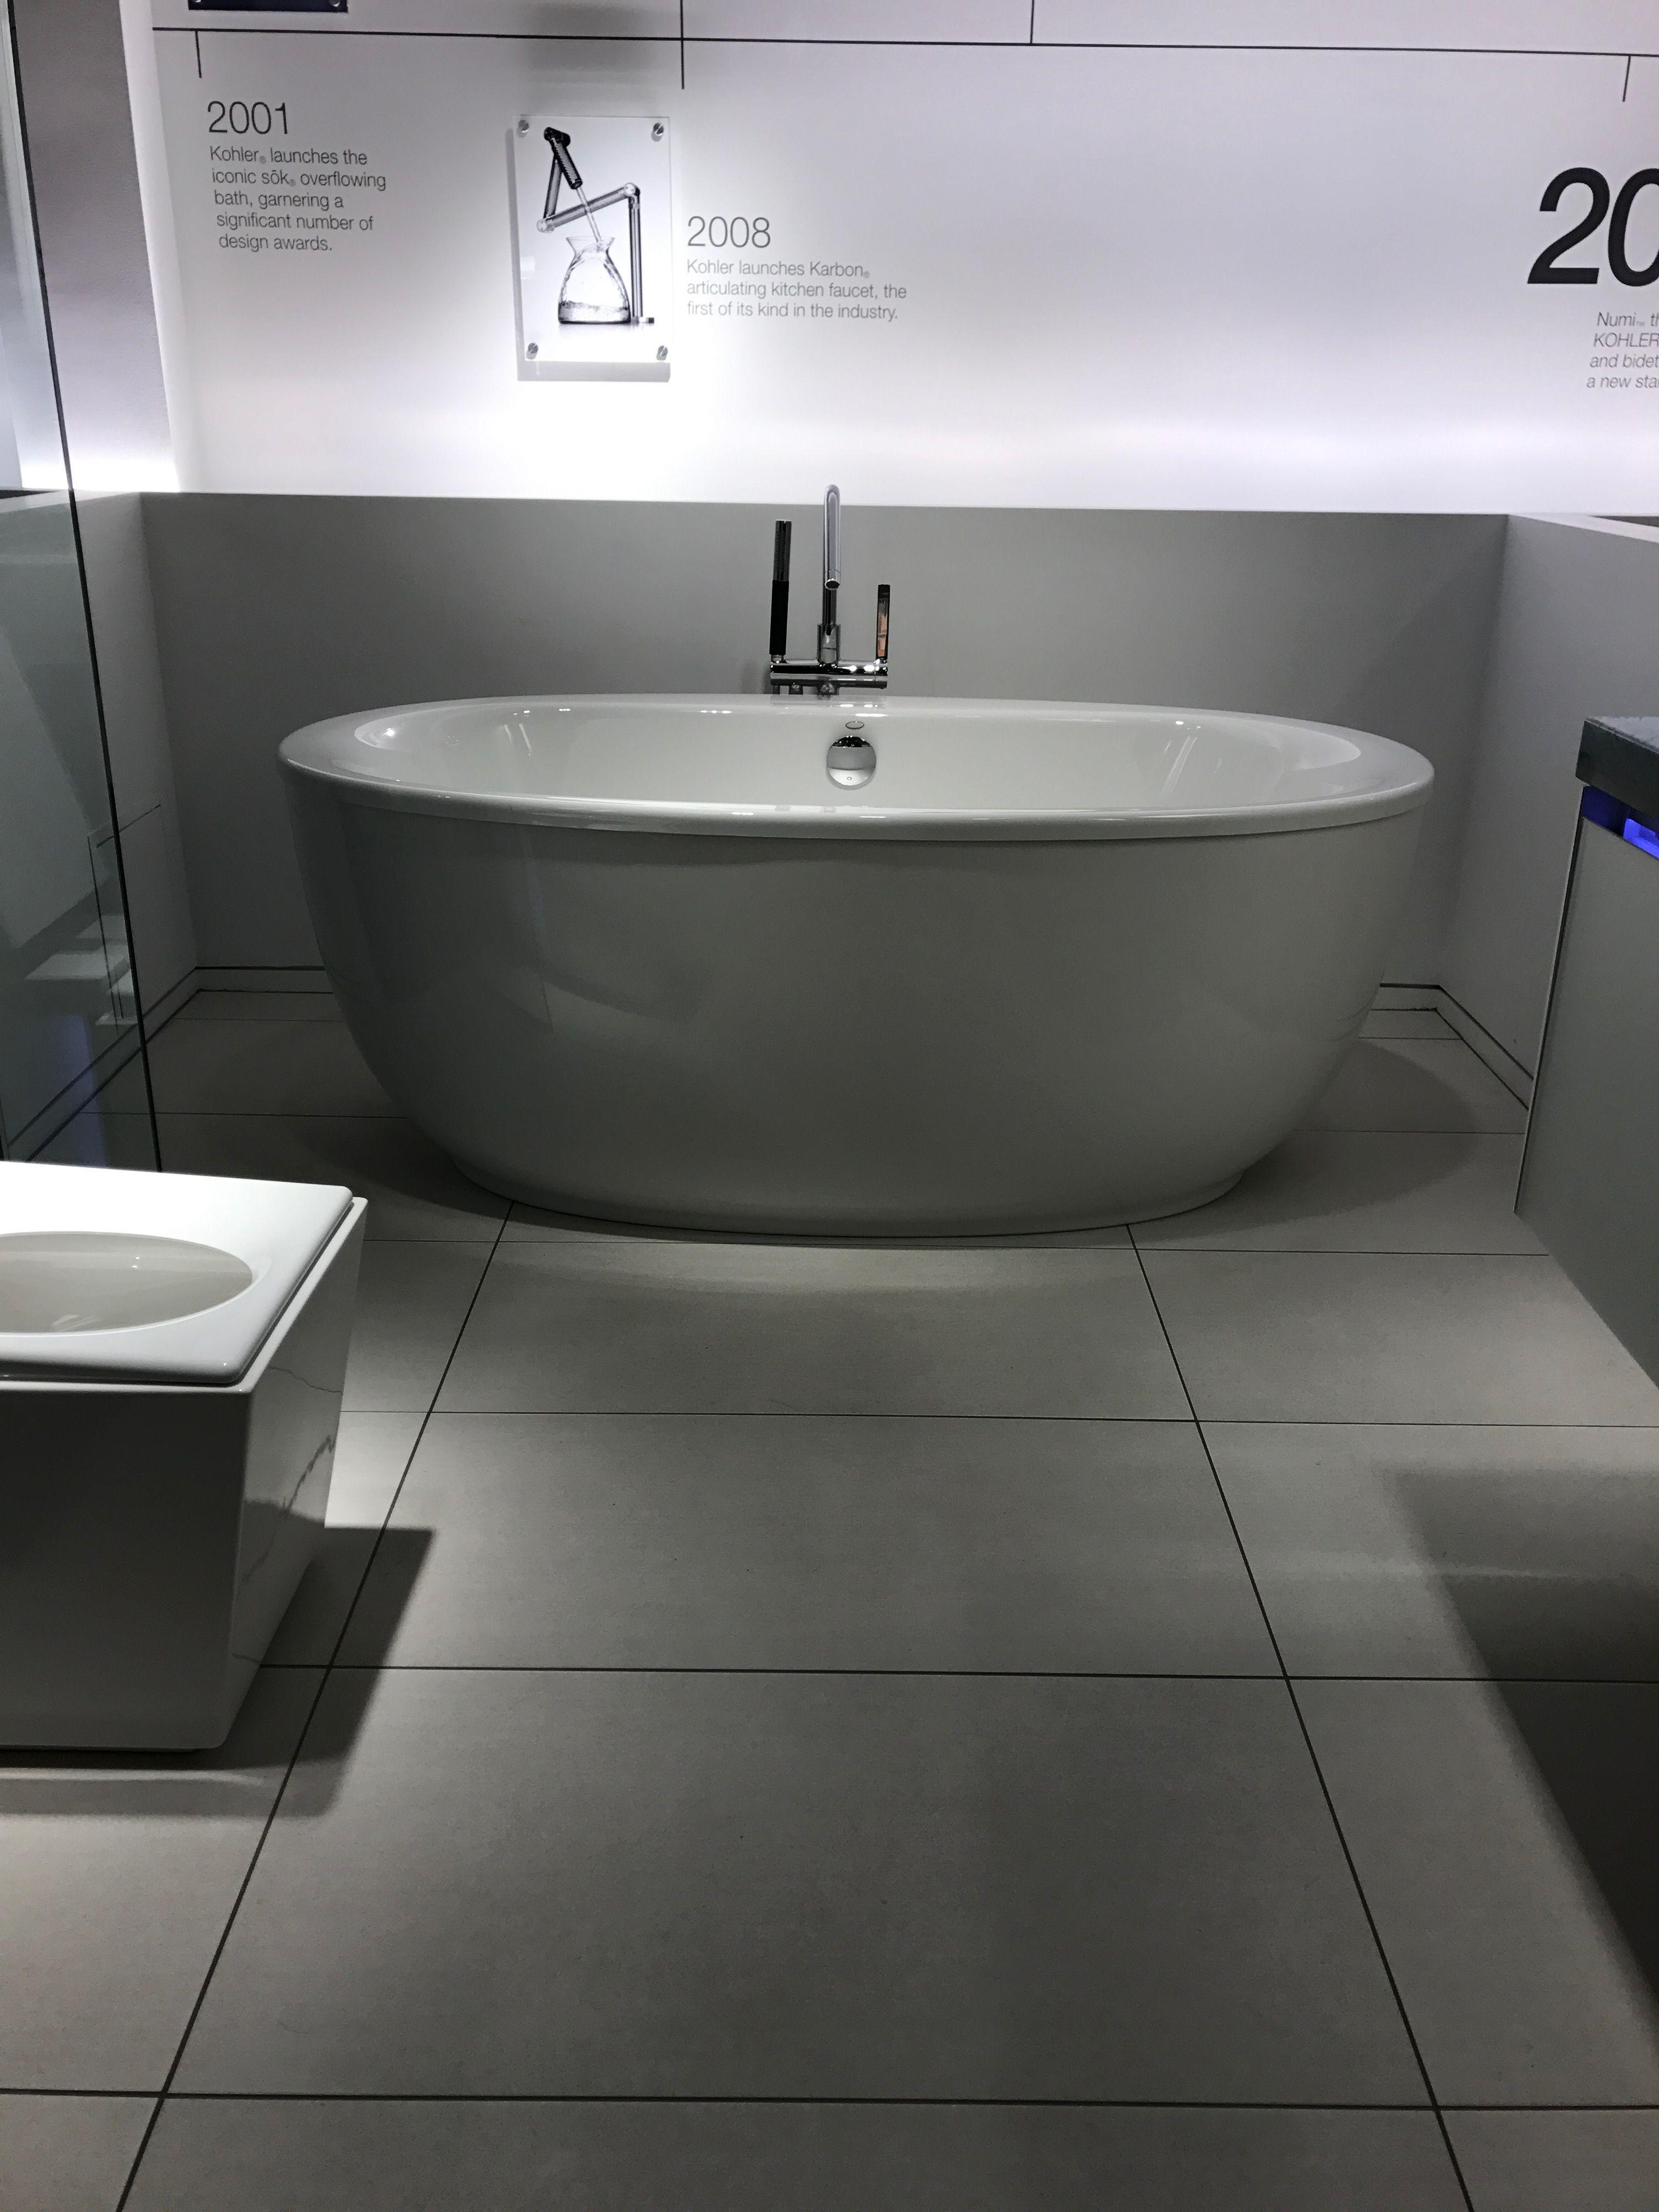 Kohler Sunstruck tub with fluted shroud | Bathroom Ideas | Pinterest ...